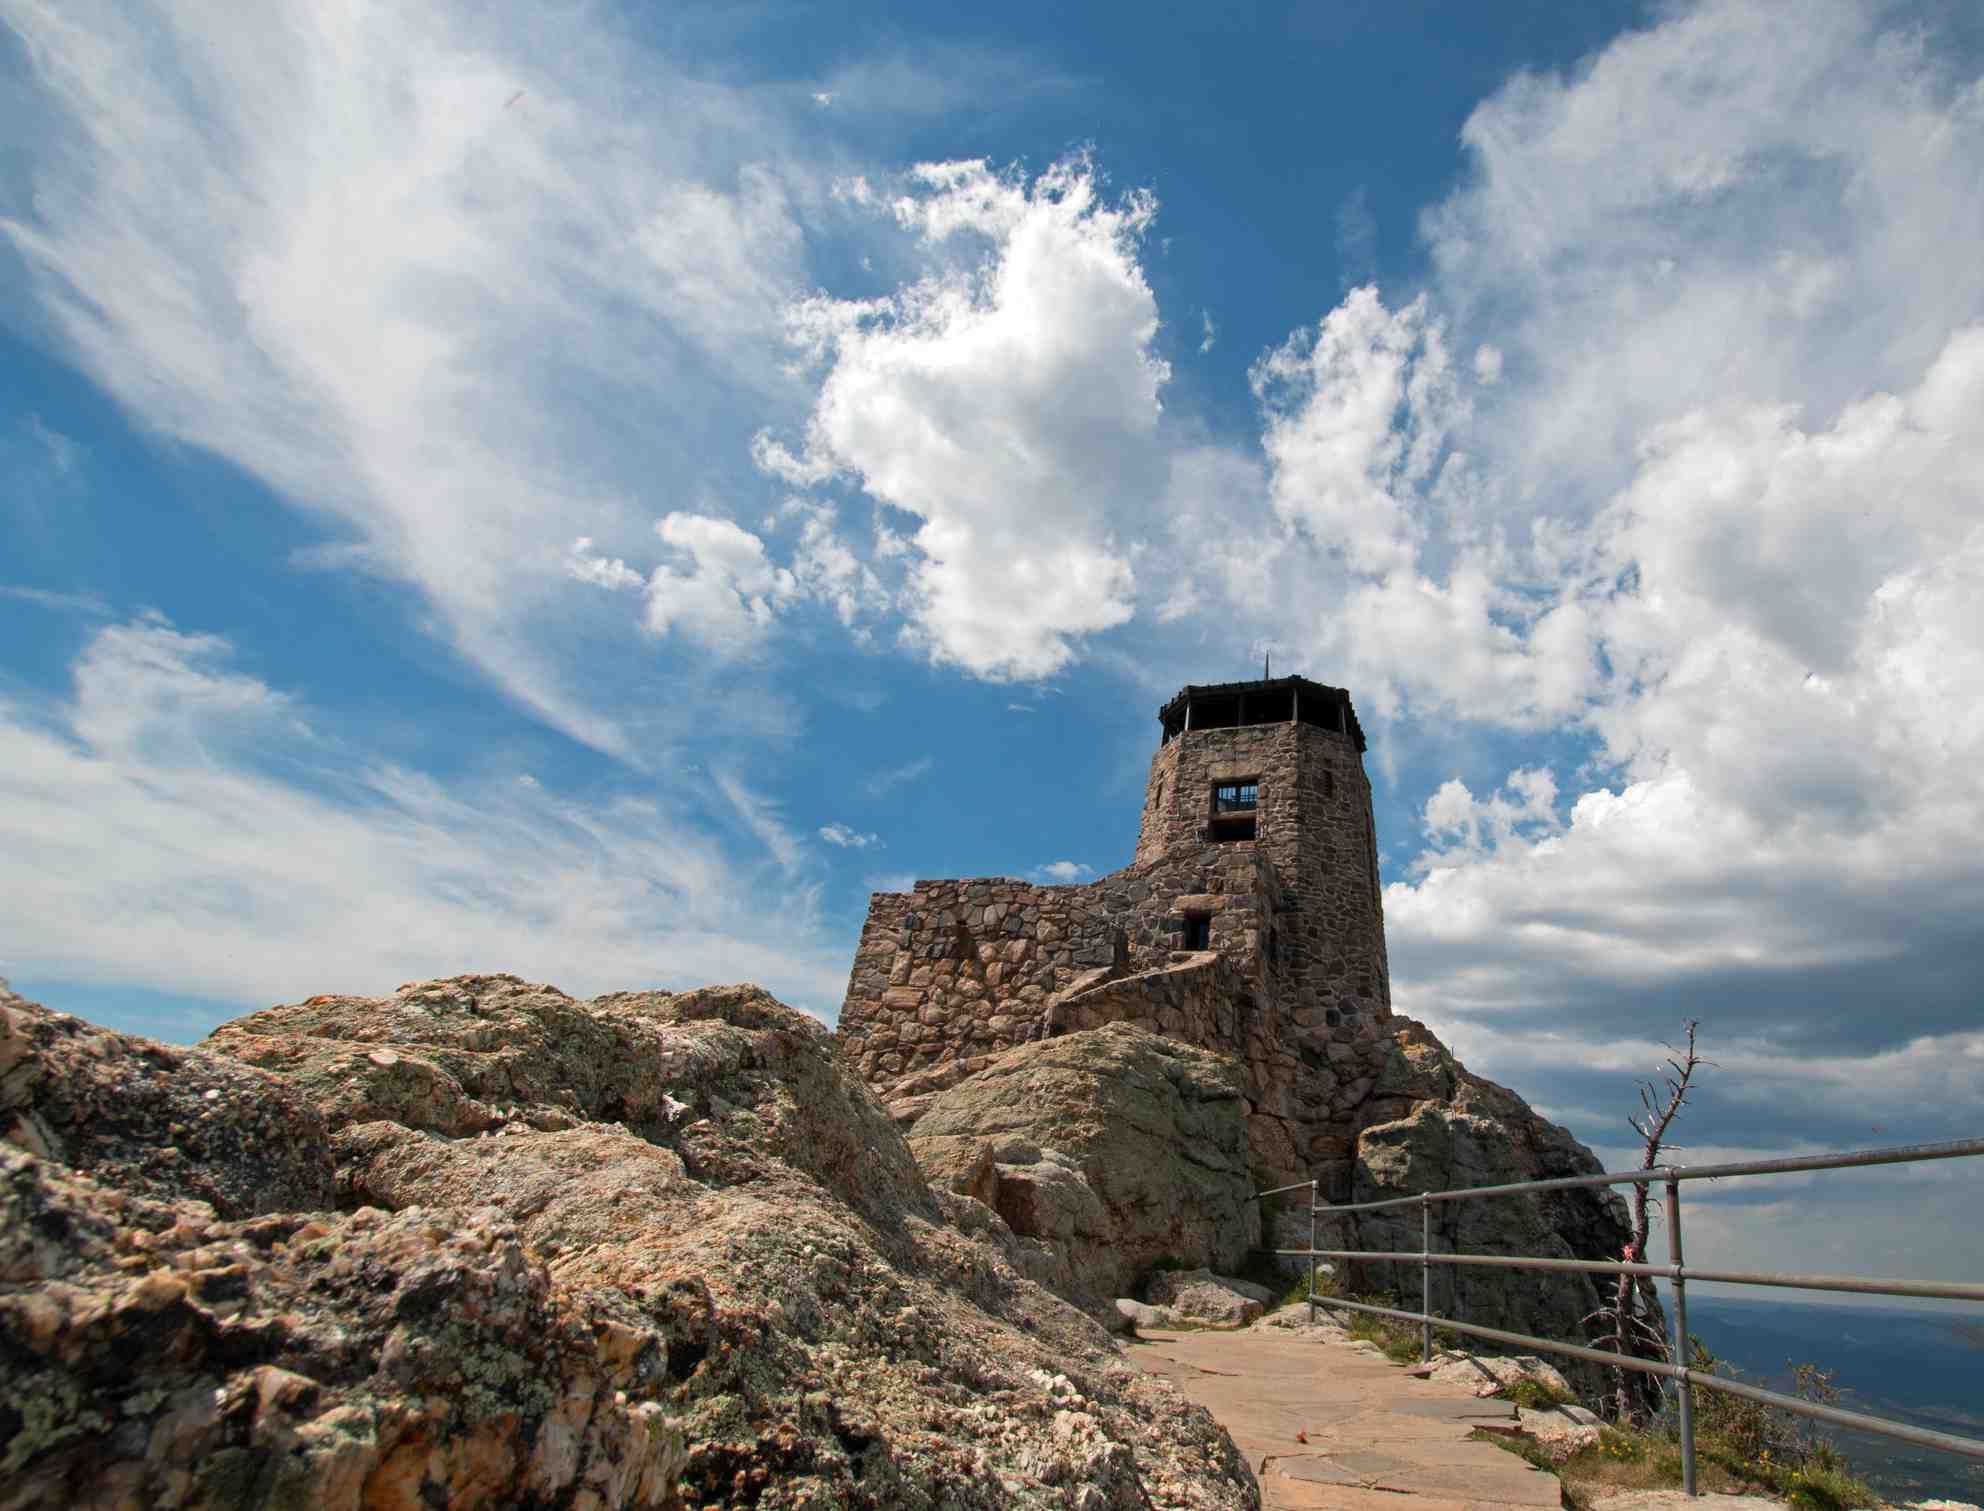 Black Elk Peak Fire Lookout Tower in Custer State Park in the Black Hills of South Dakota